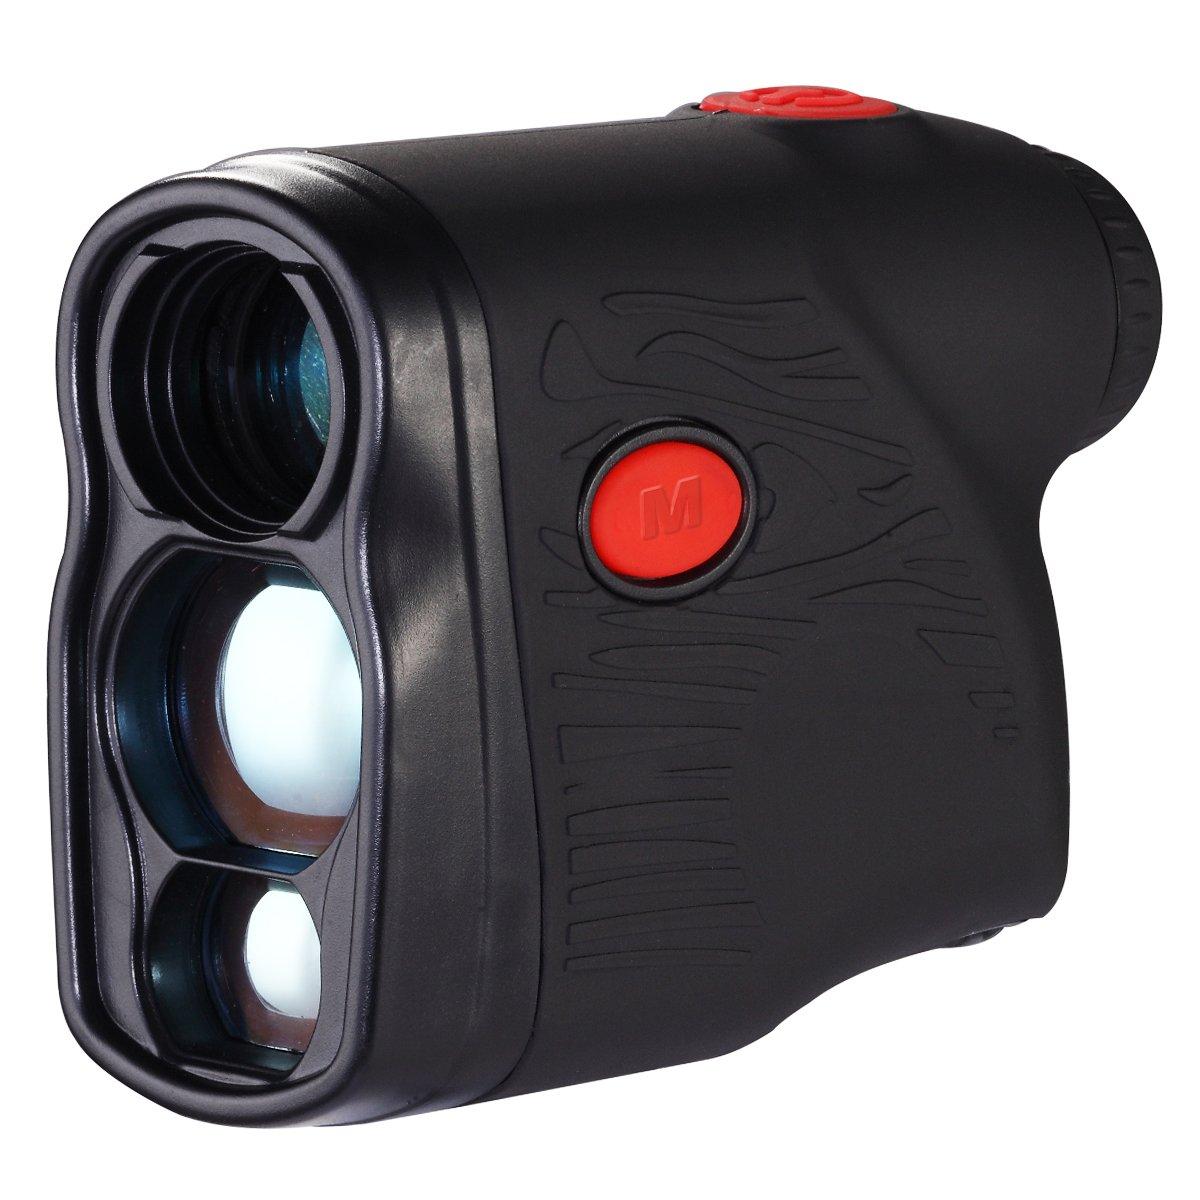 LaserWorks Long Distance 1200 Yards Hunting Rangefinder - Horizontal Distance, Speed, Scan Laser Range Finder